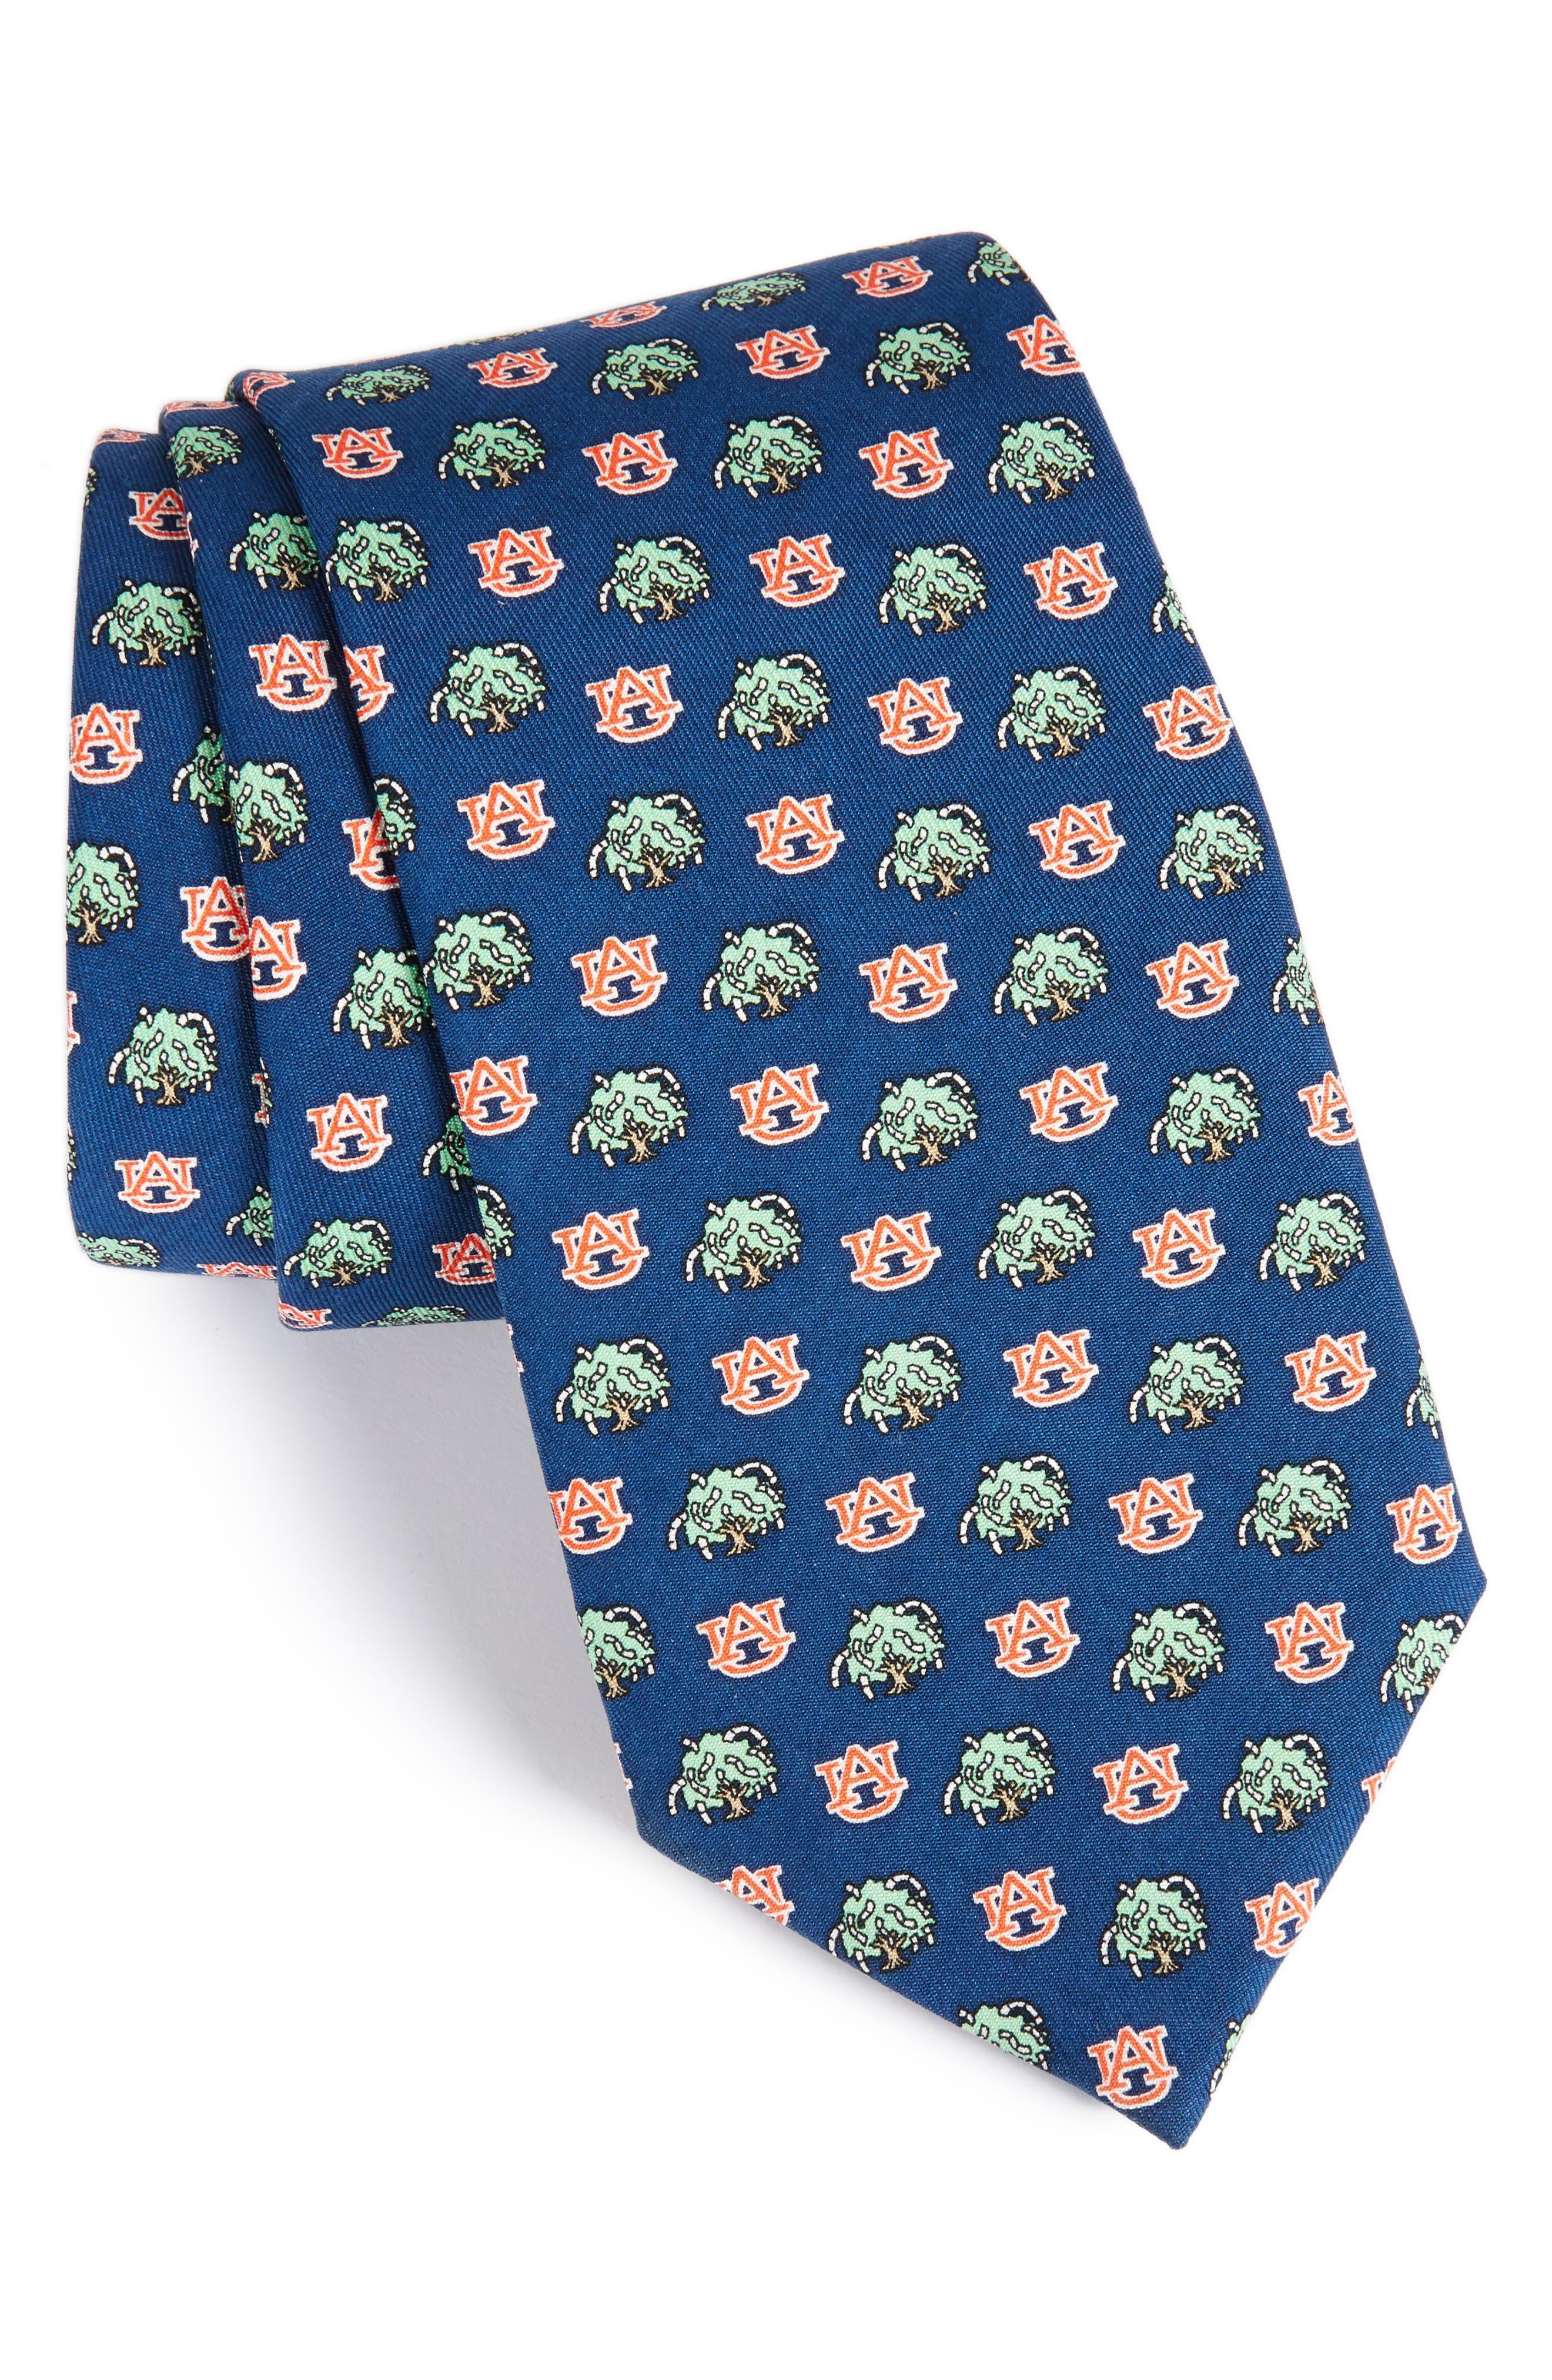 VINEYARD VINES Auburn Tigers Silk Tie